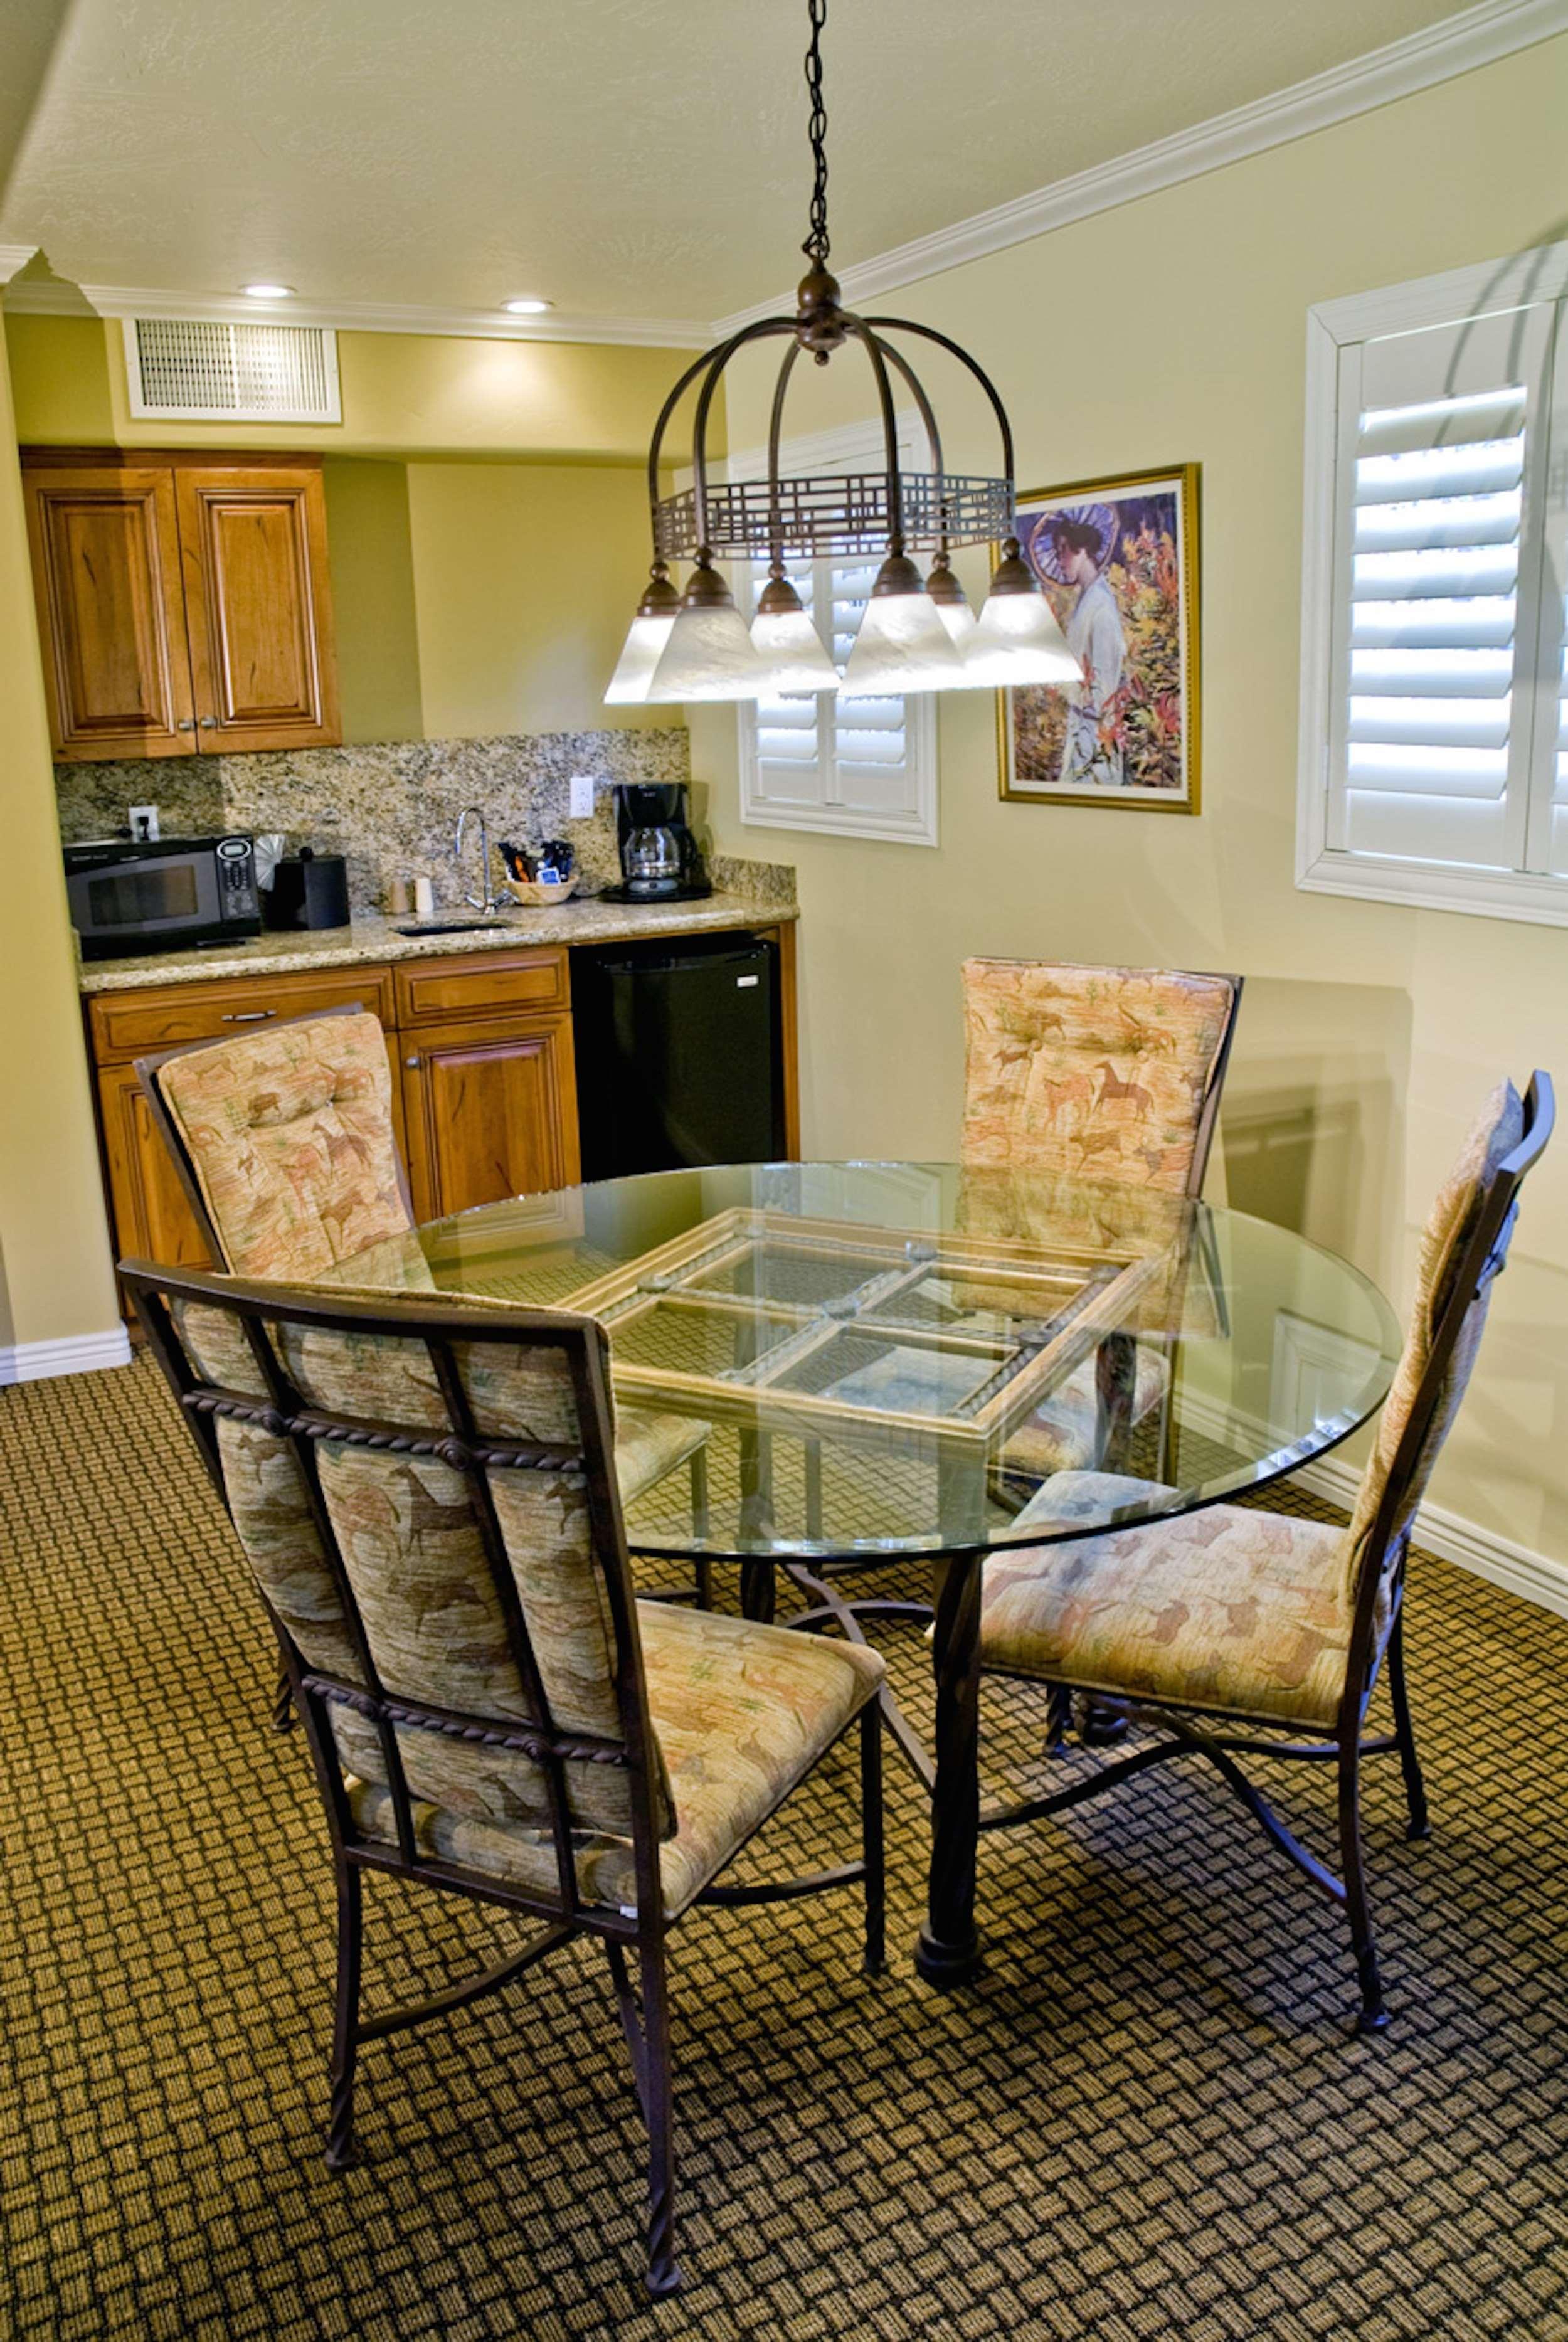 Best Western Plus Arroyo Roble Hotel & Creekside Villas image 36